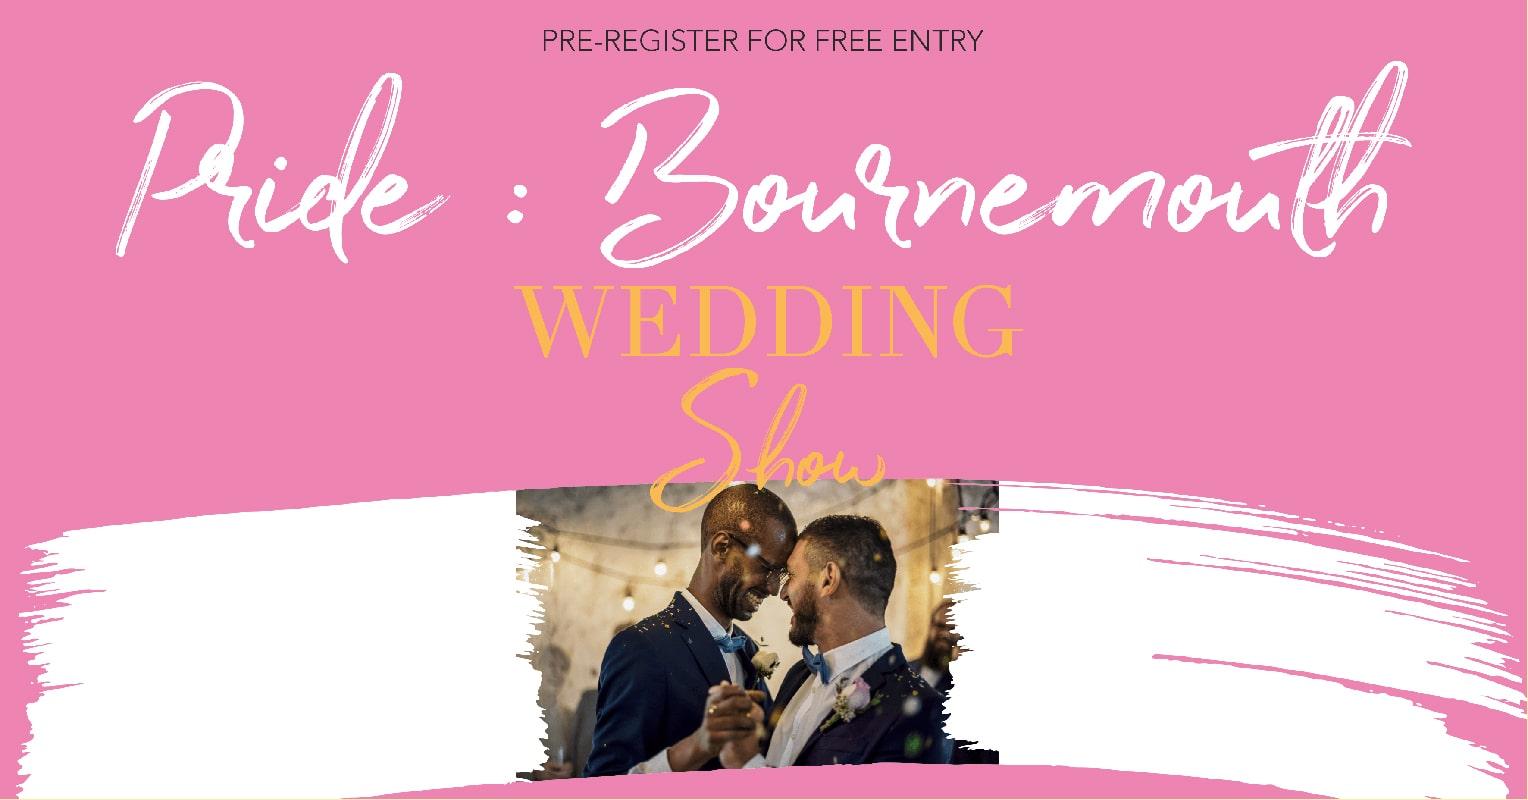 pride dorset bournemouth wedding show banner min 1